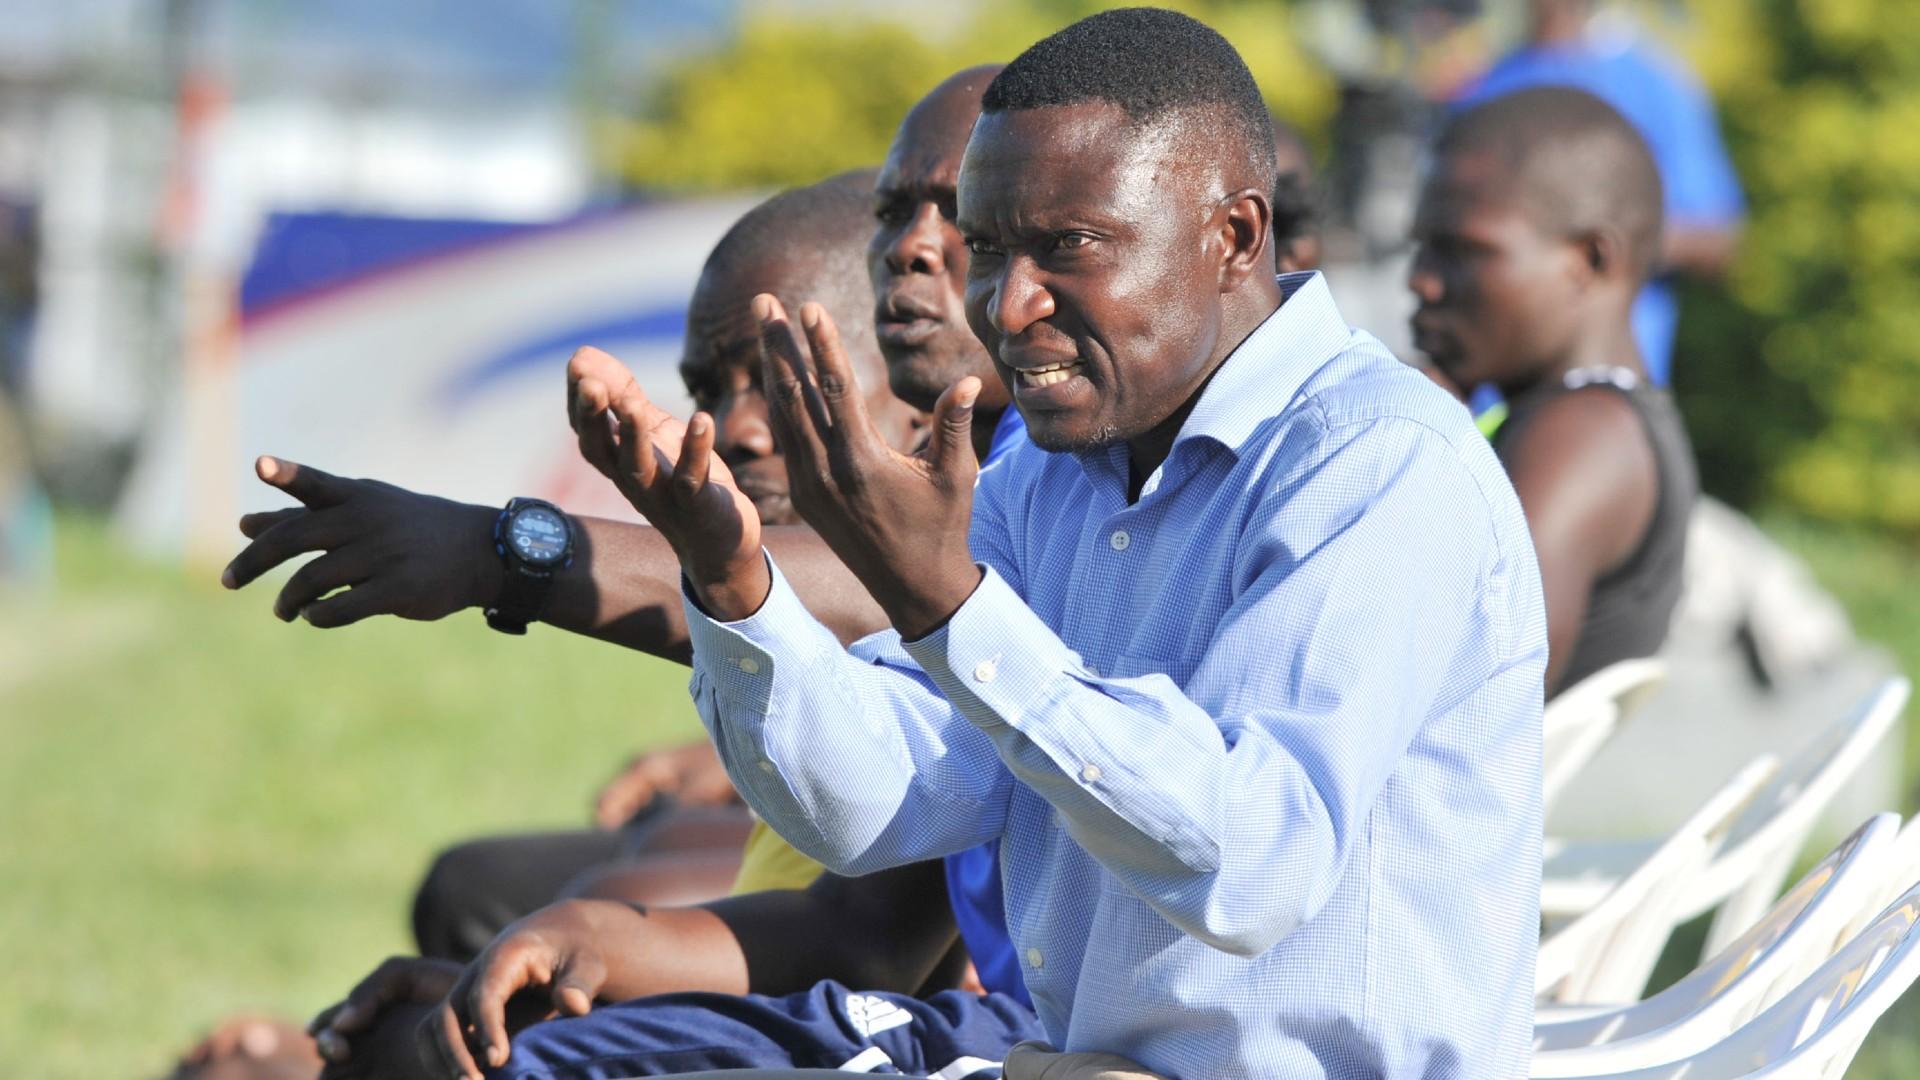 morley byekwaso of uganda u20 team u00qgupfqmi61barrbzfbcr7v